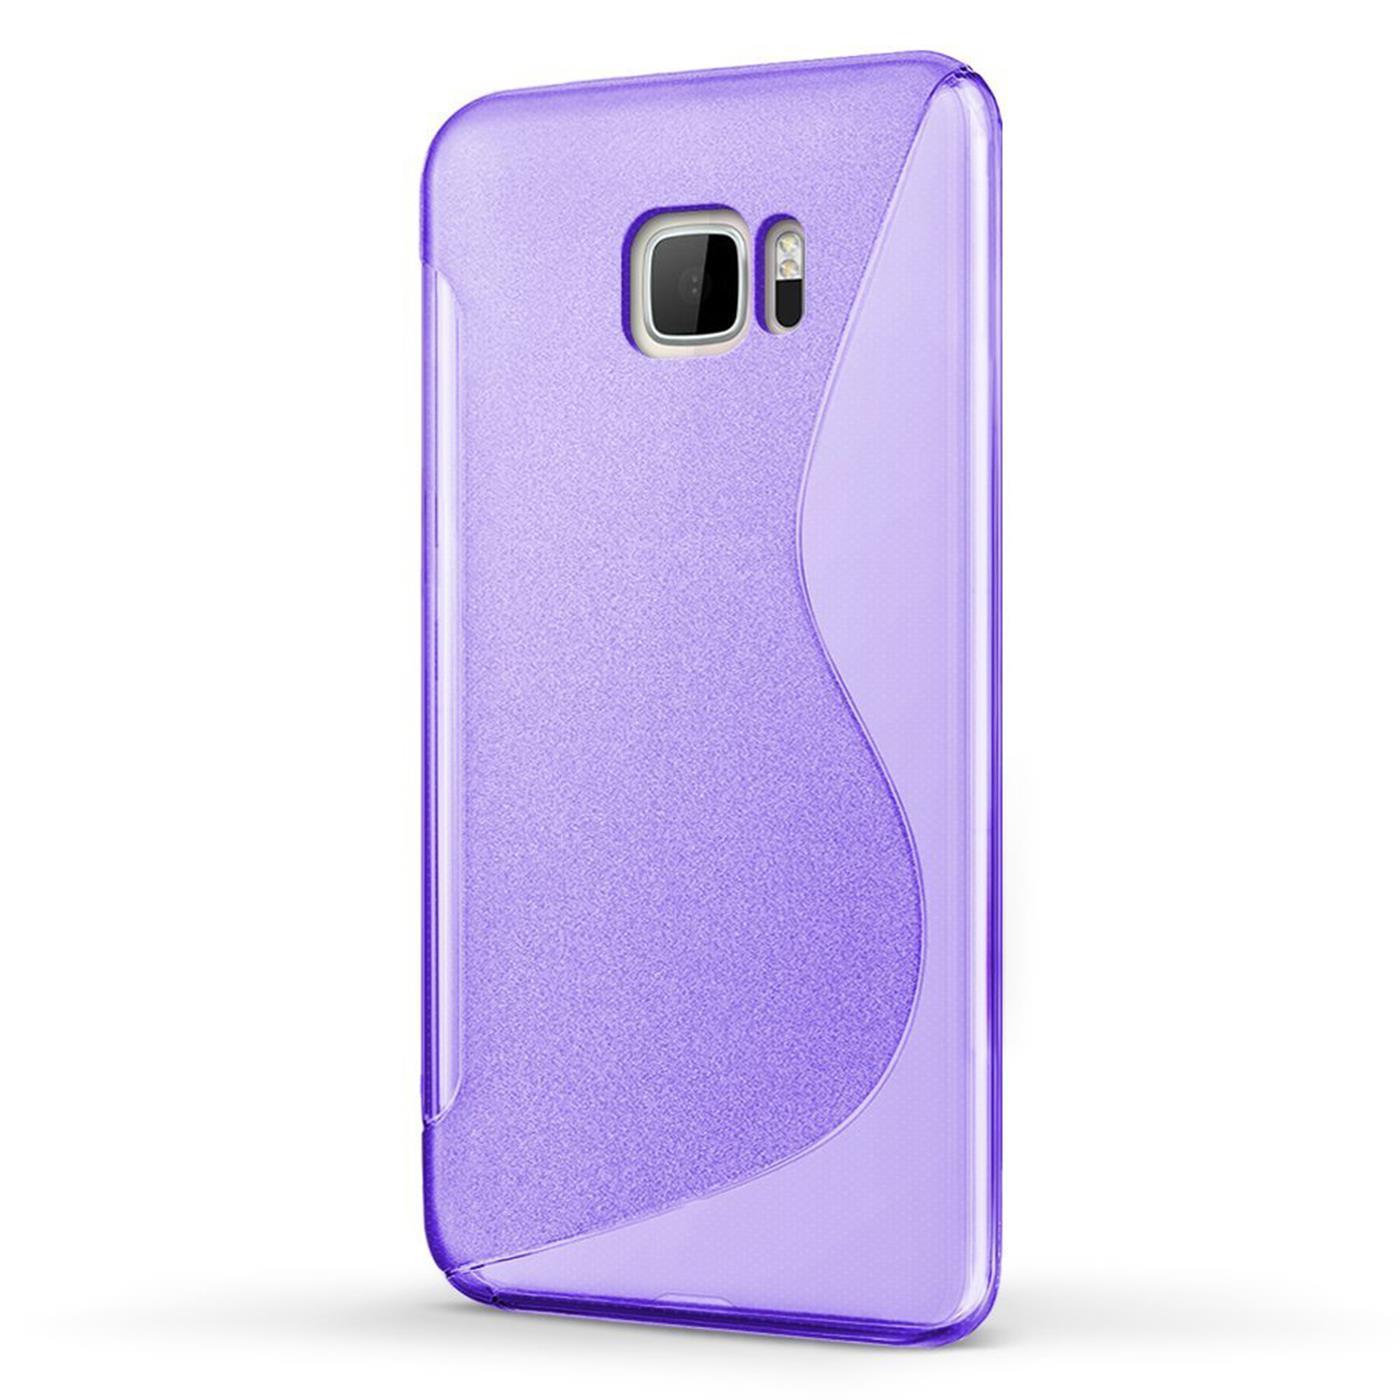 HTC-One-m9-Silikon-Gel-S-Line-Case-Cover-Ultra-Thin-Slim-Back-Bumper Indexbild 12